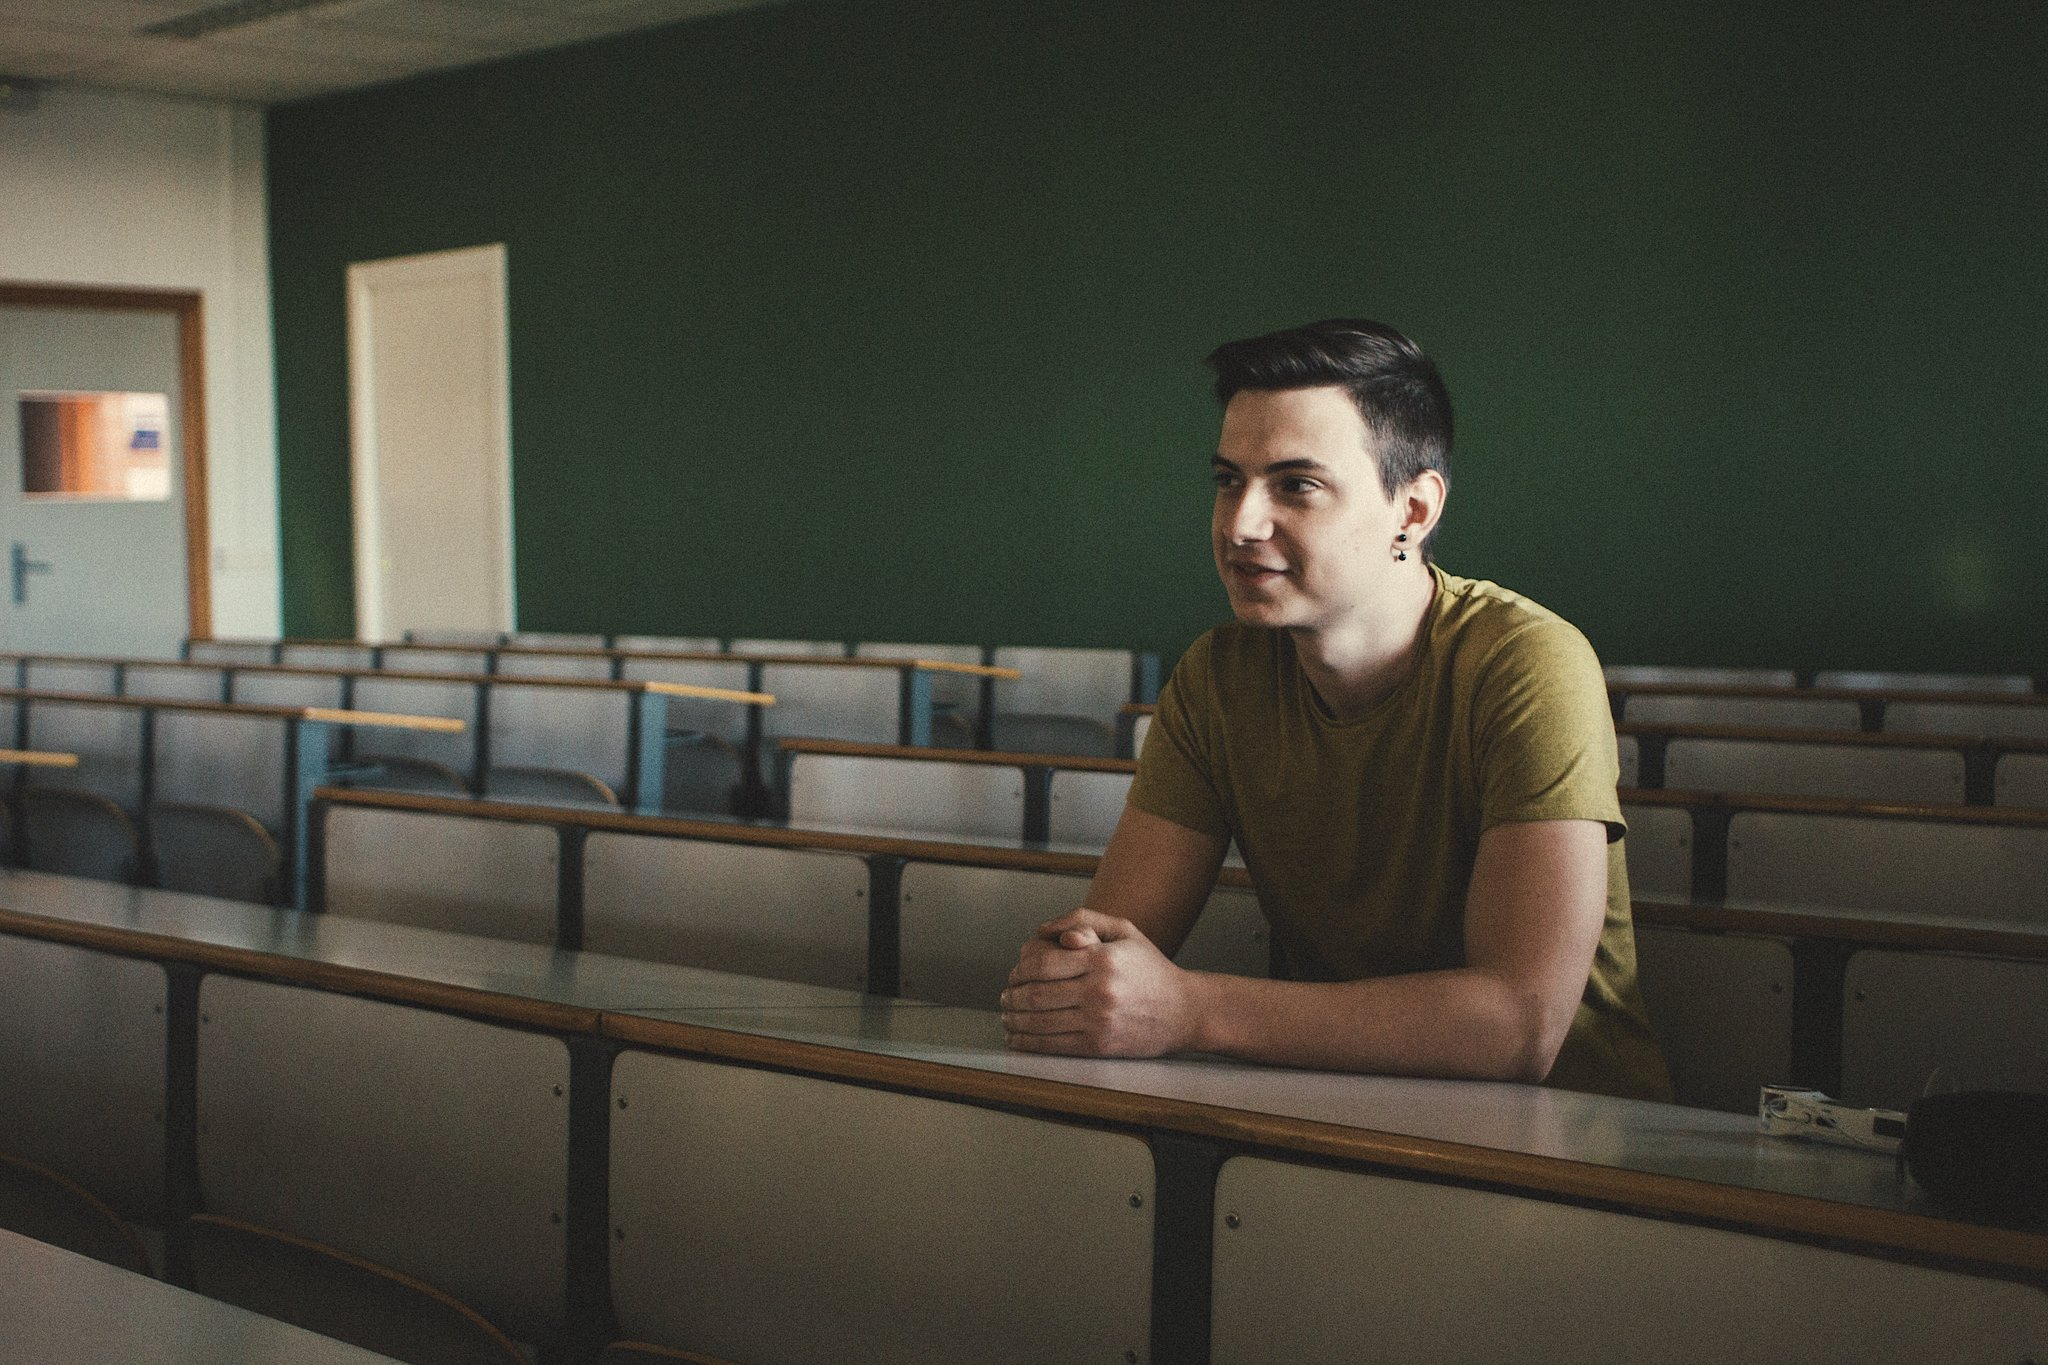 Man in a university classroom